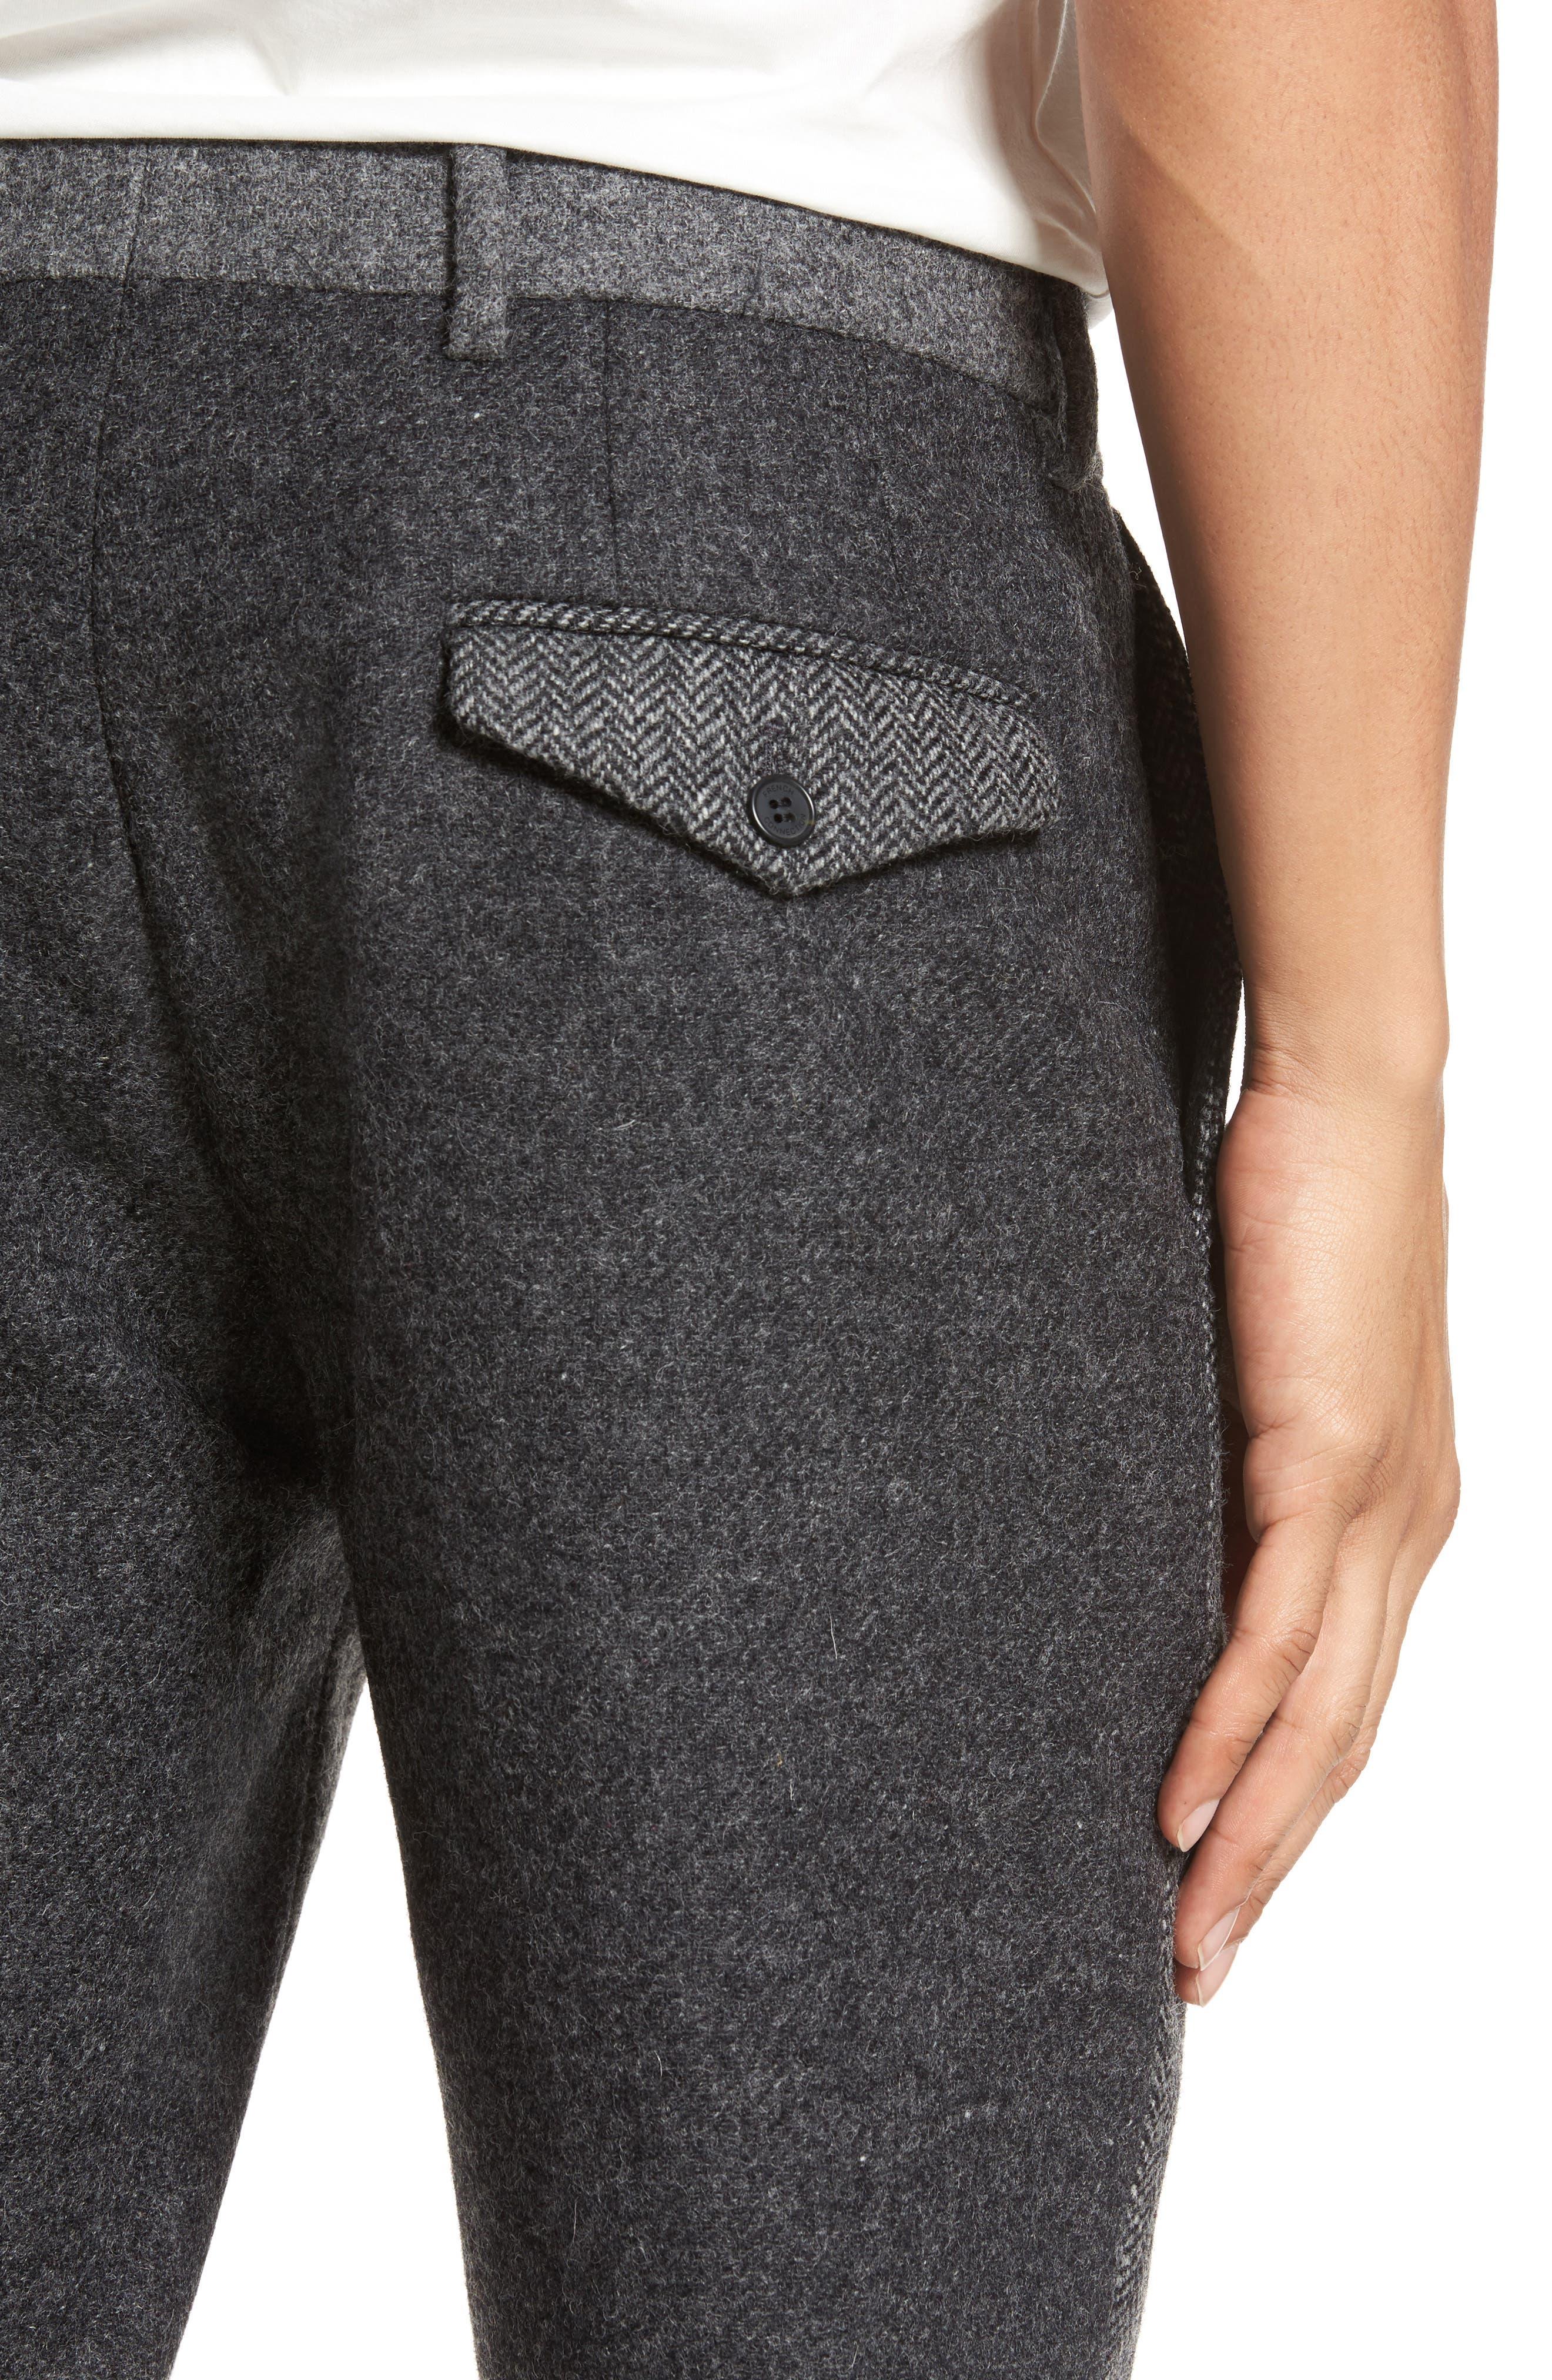 Patchwork Wool Trousers,                             Alternate thumbnail 4, color,                             Grey Melange